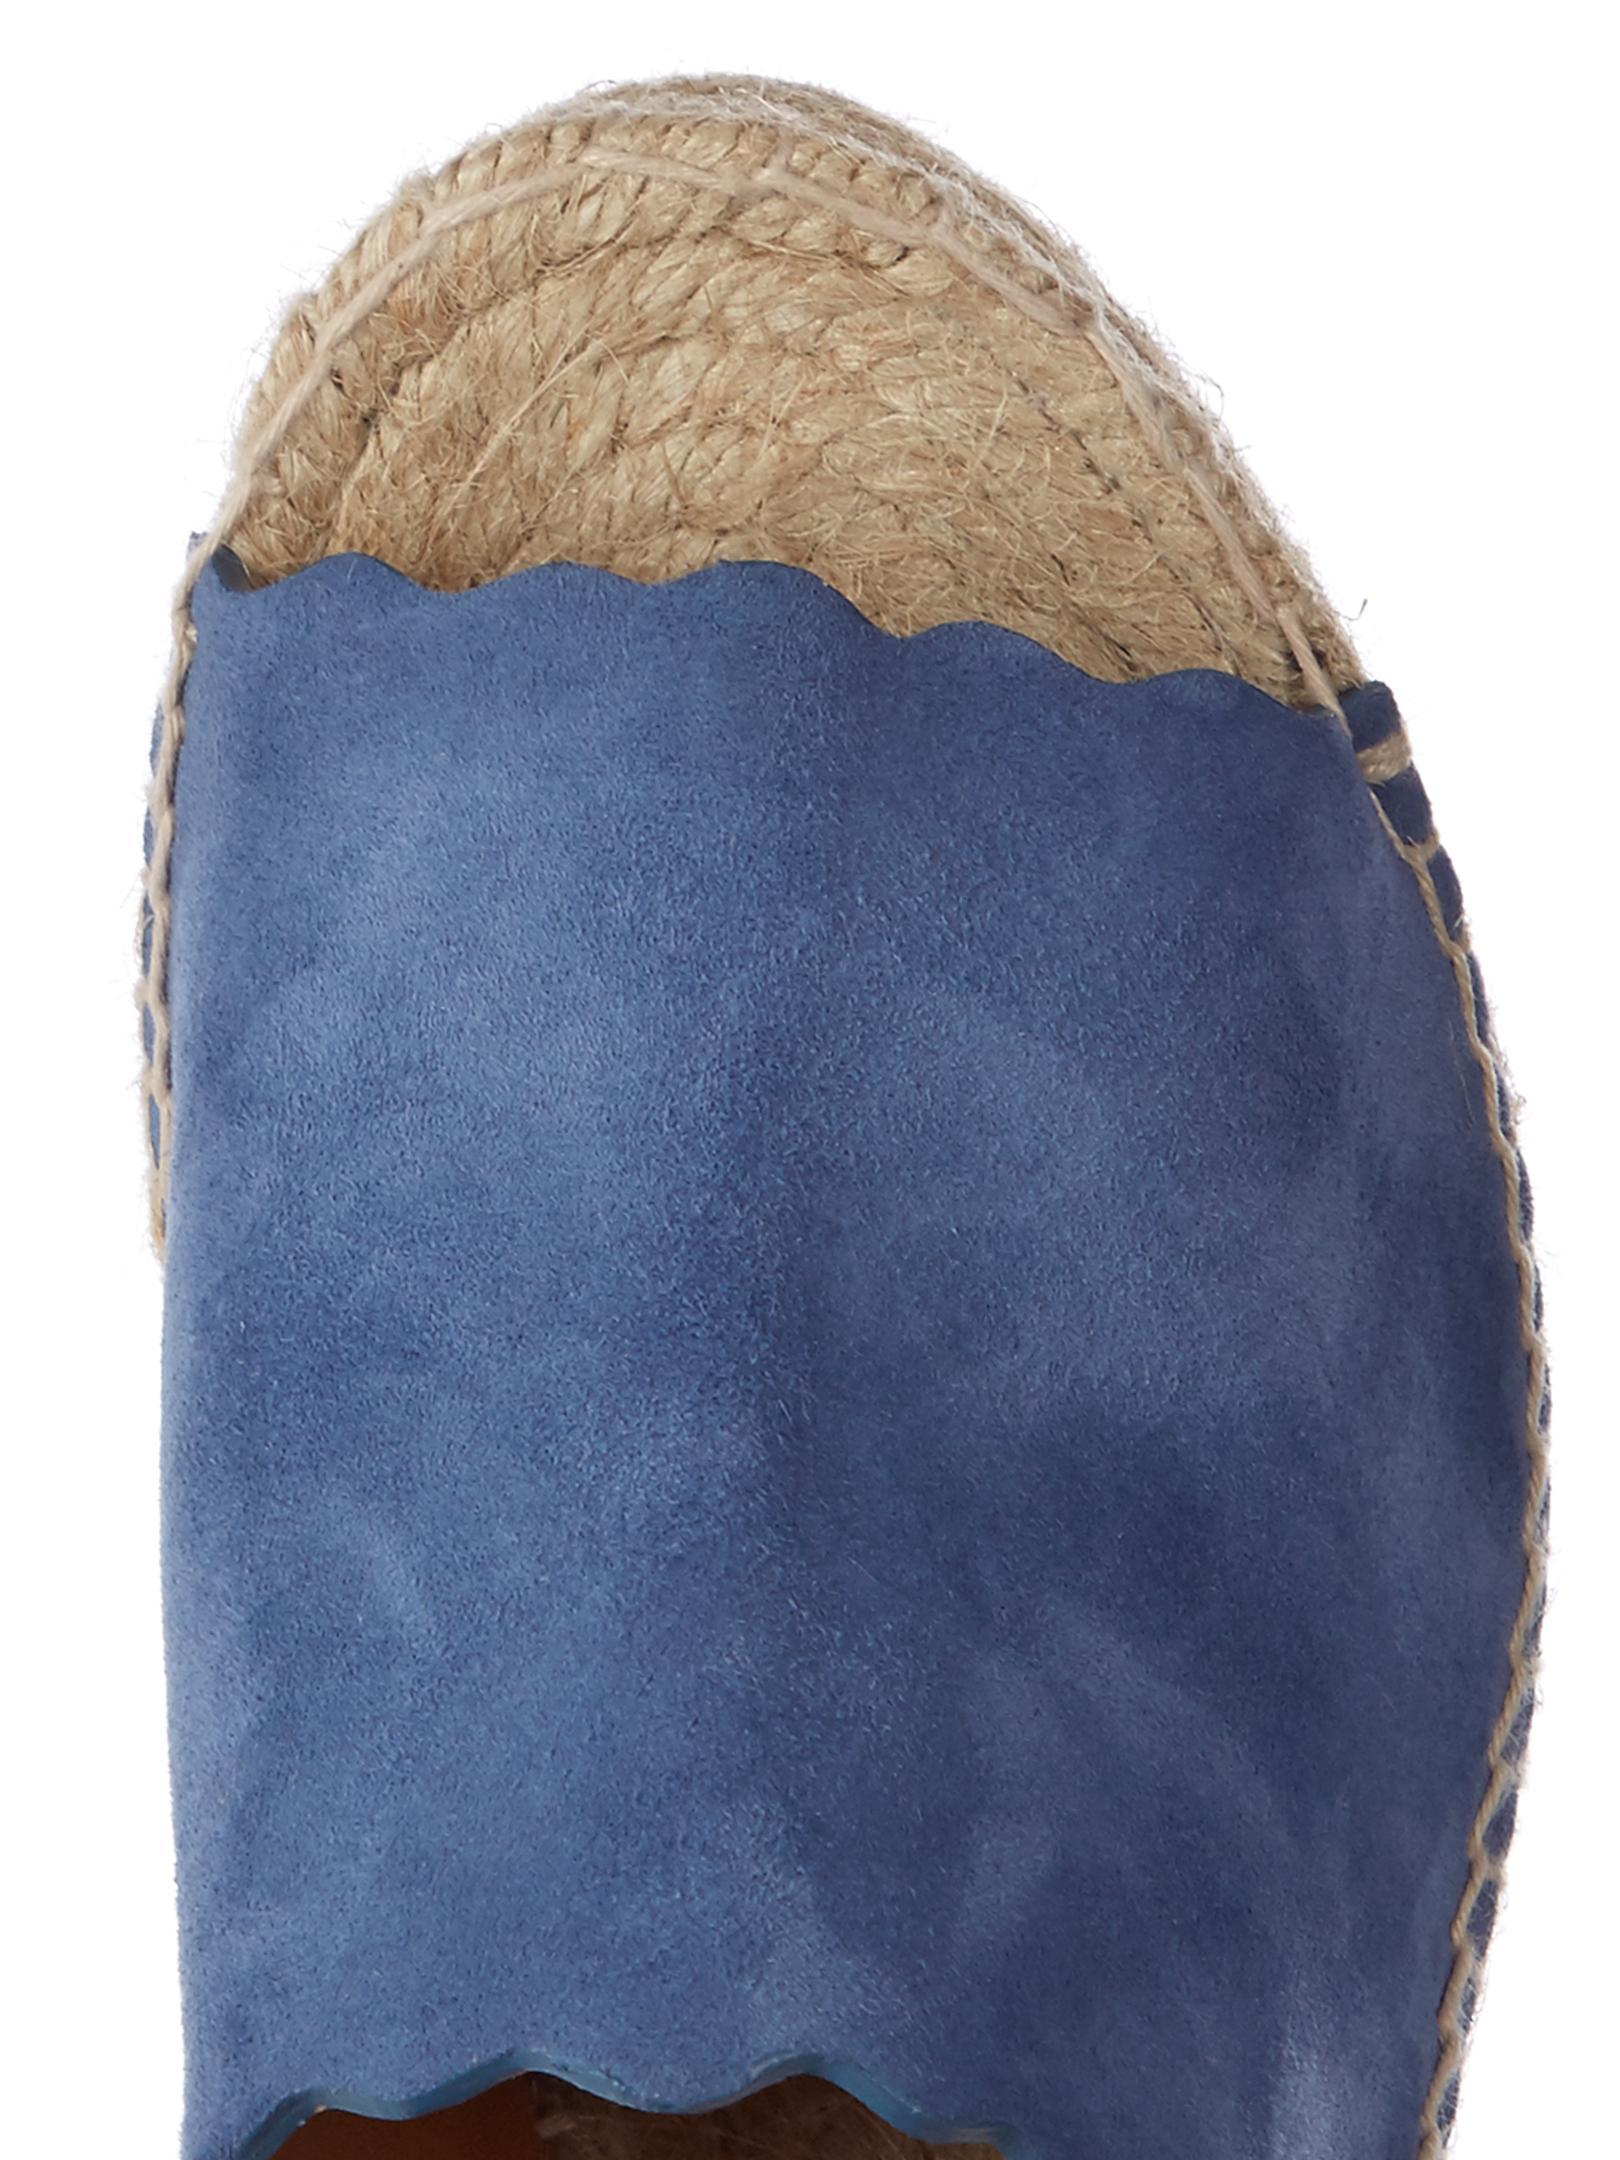 5f7ee10872419 Lyst - Chloé Lauren Suede Espadrille Wedge Sandals in Blue